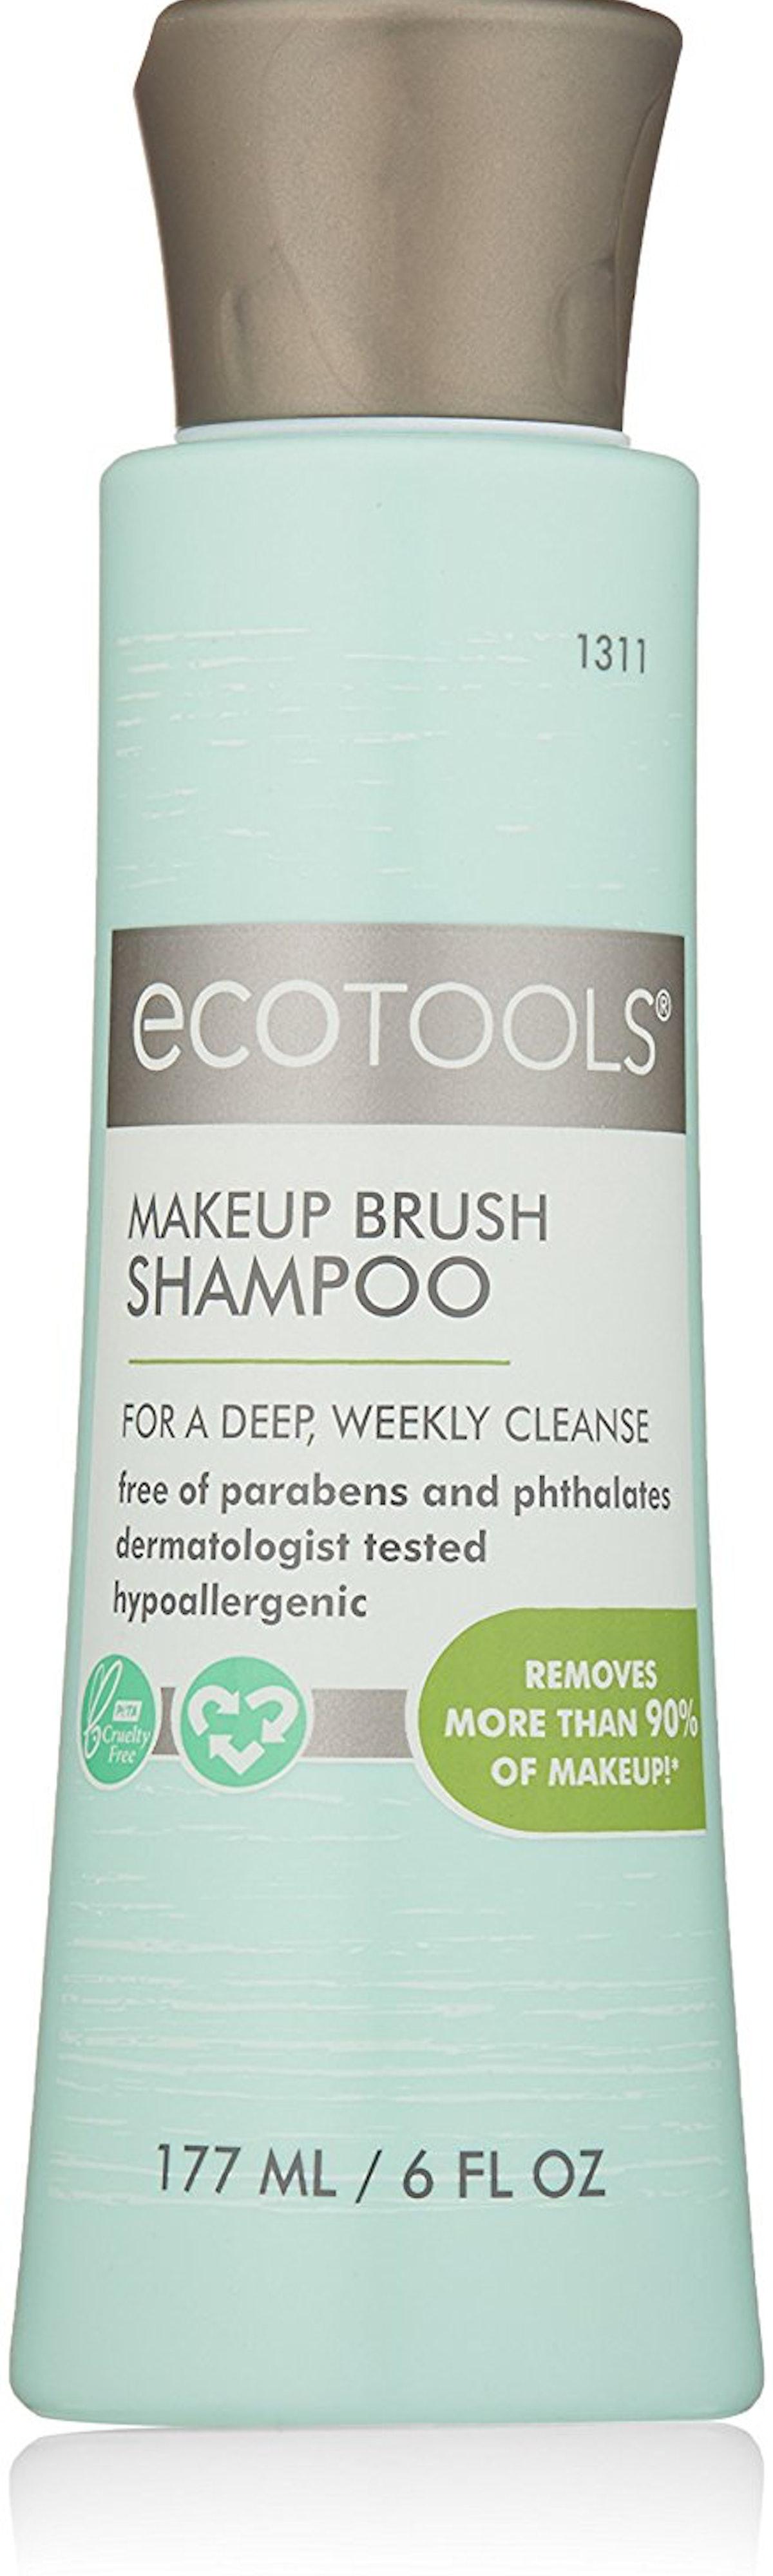 Ecotools Makeup Brush Cleansing Shampoo, 6 oz